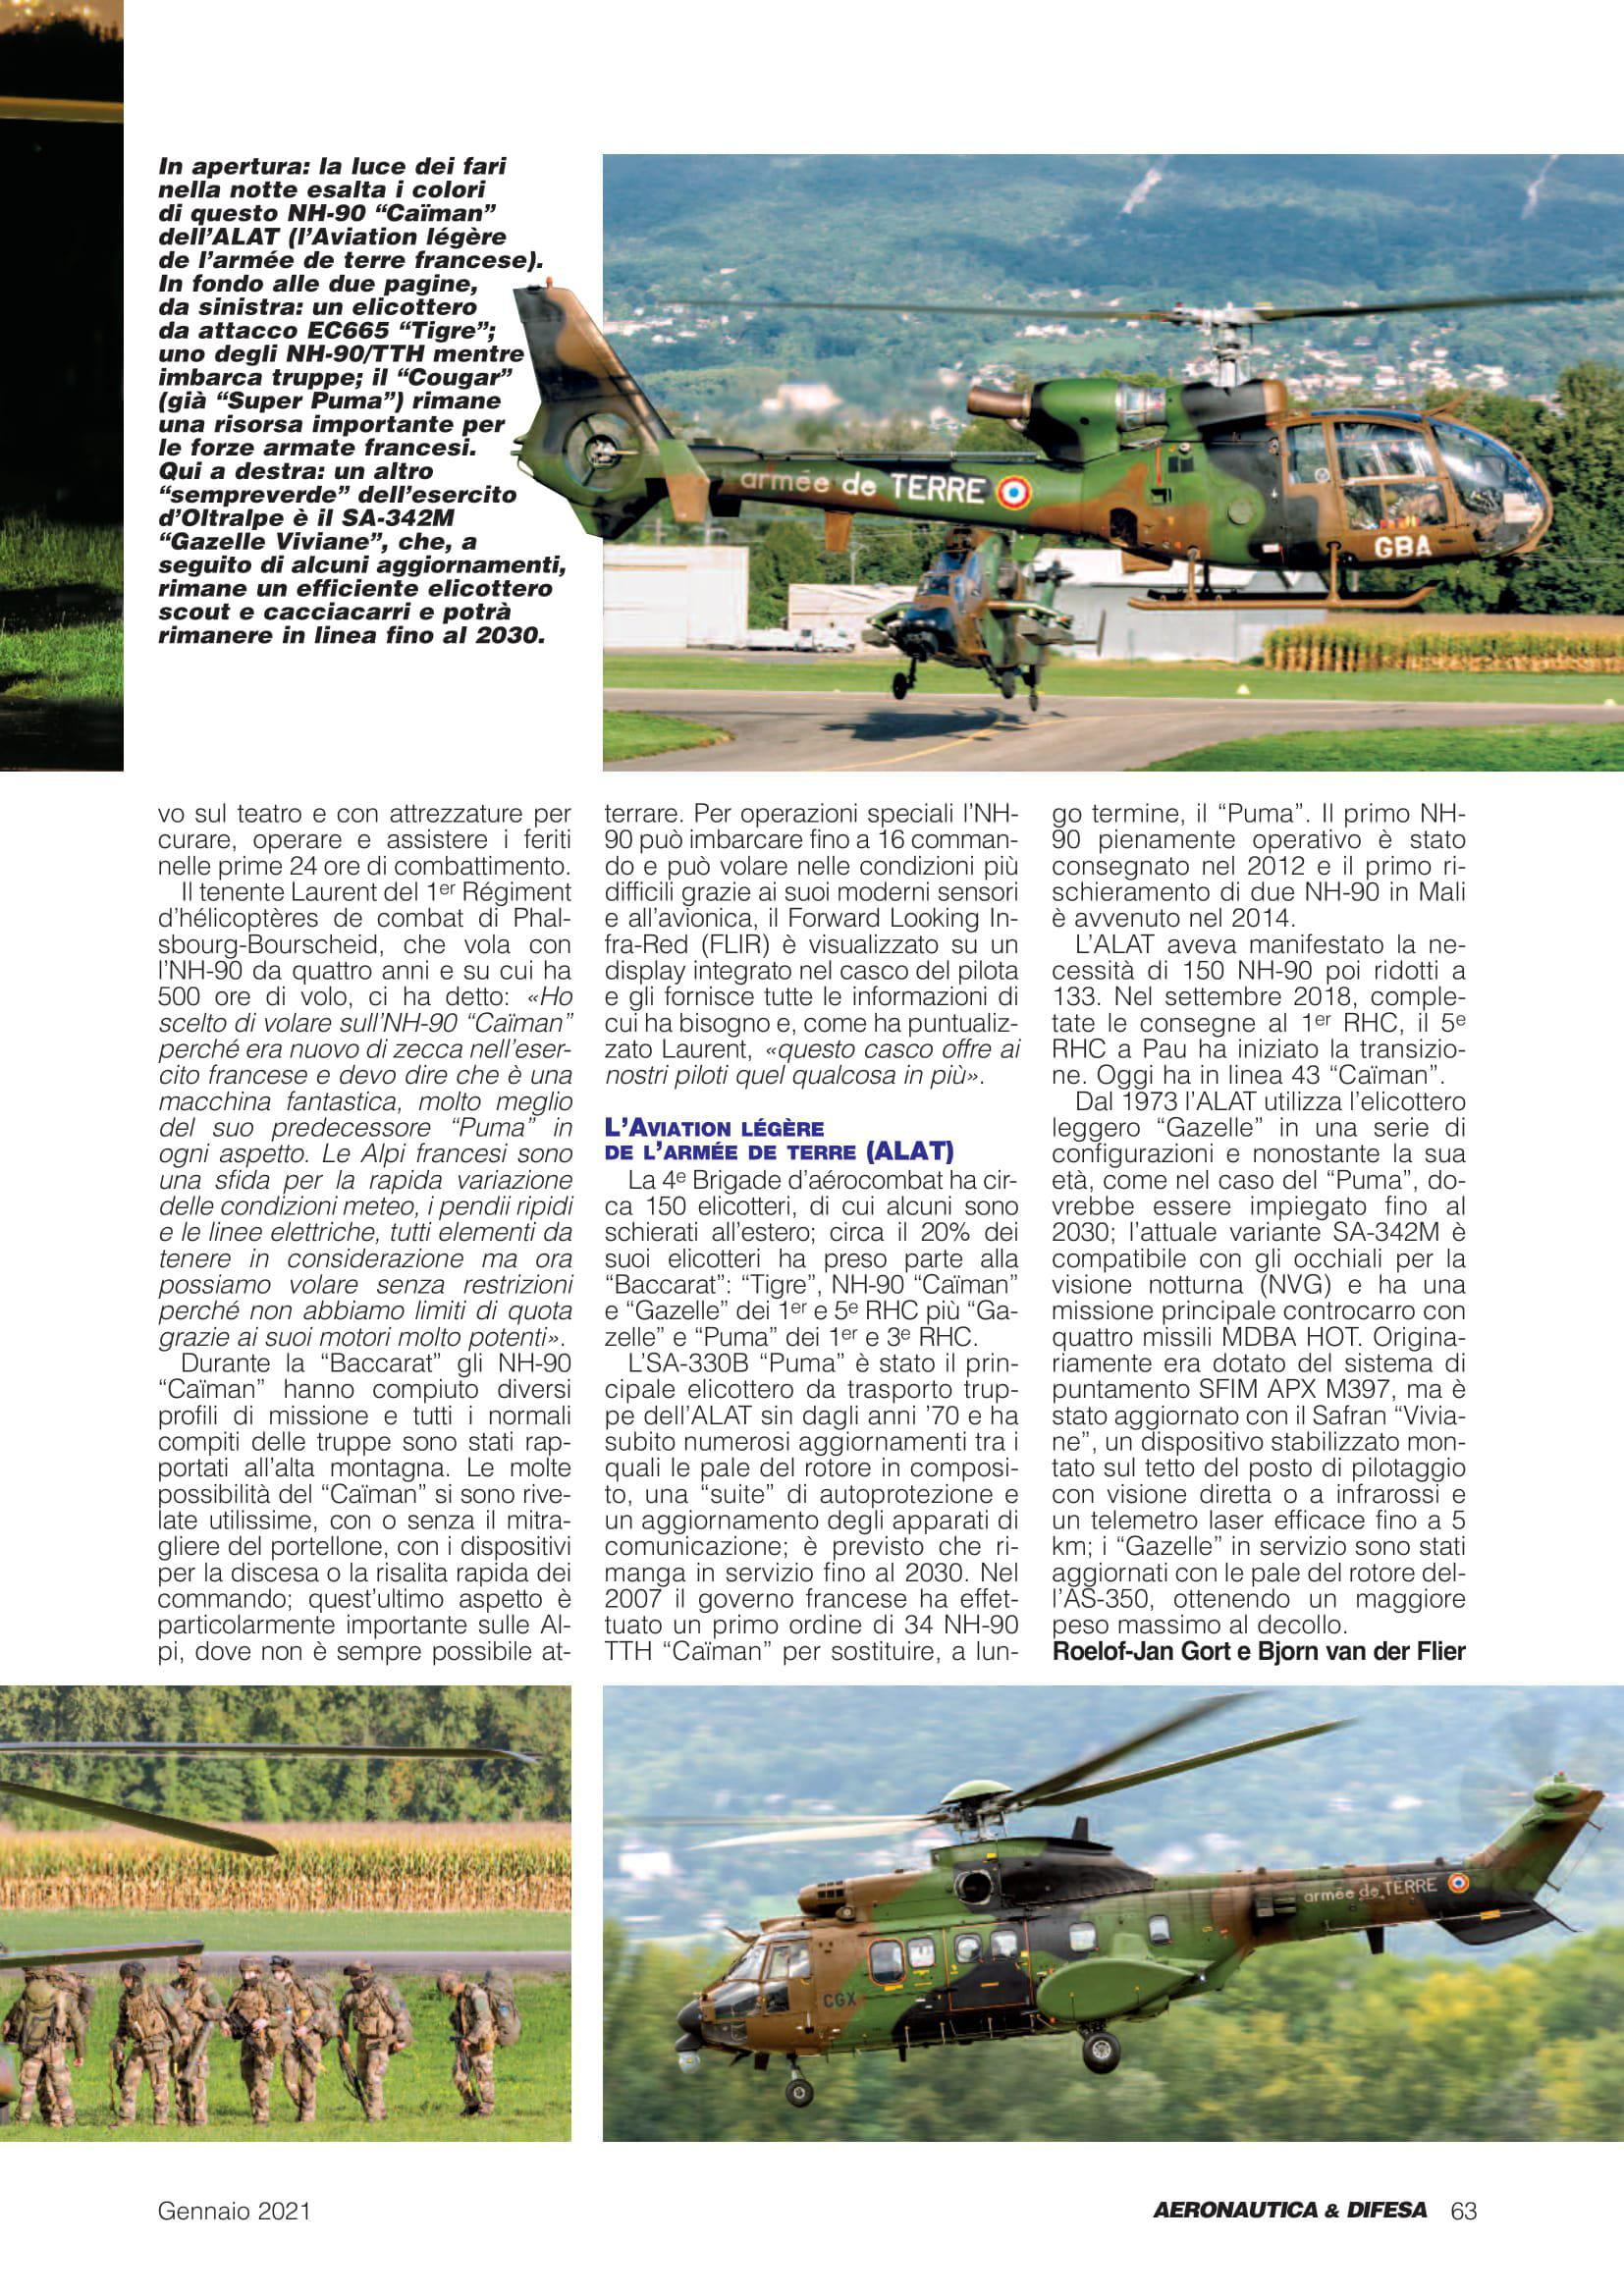 Aeronautica & Difesa (Italy)_Baccarat 2020-3